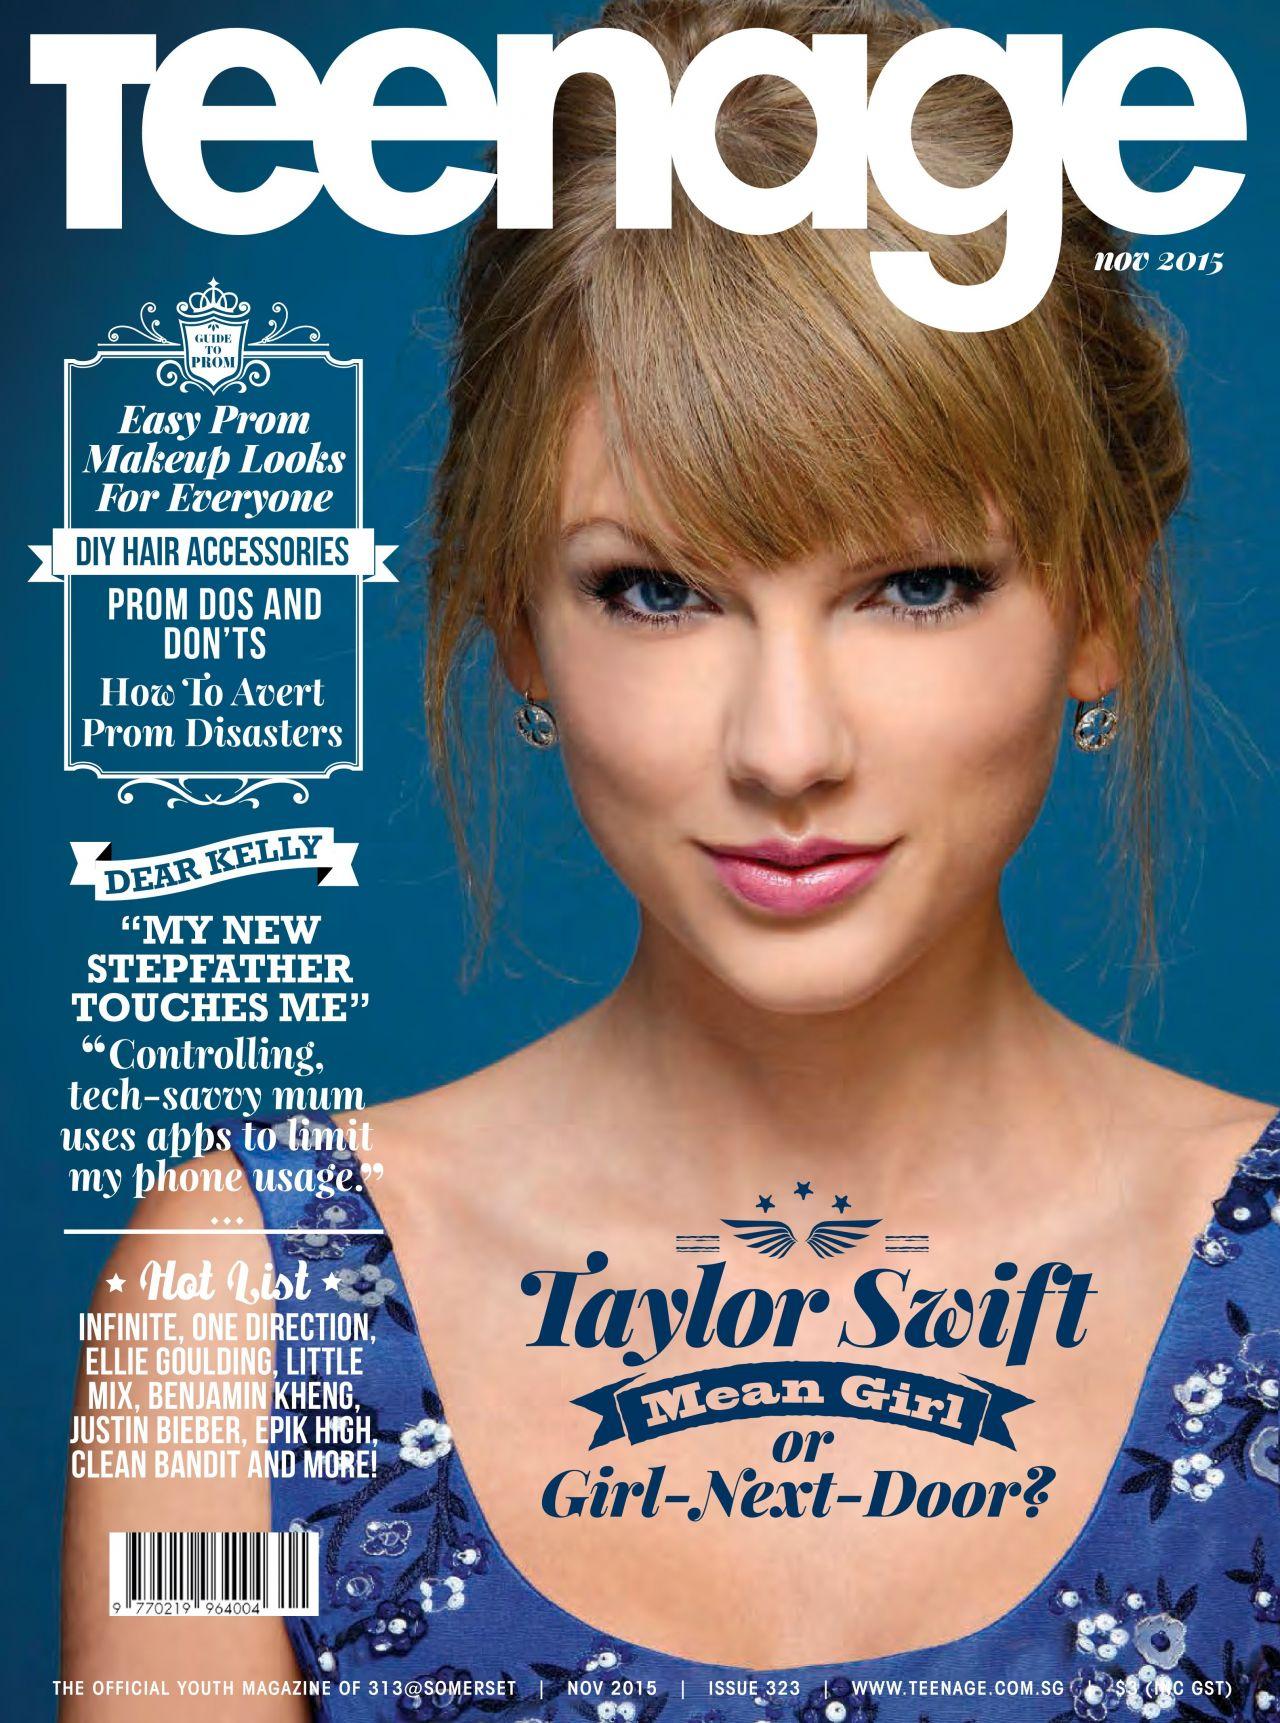 Teenage Magazine November 2015 Cover